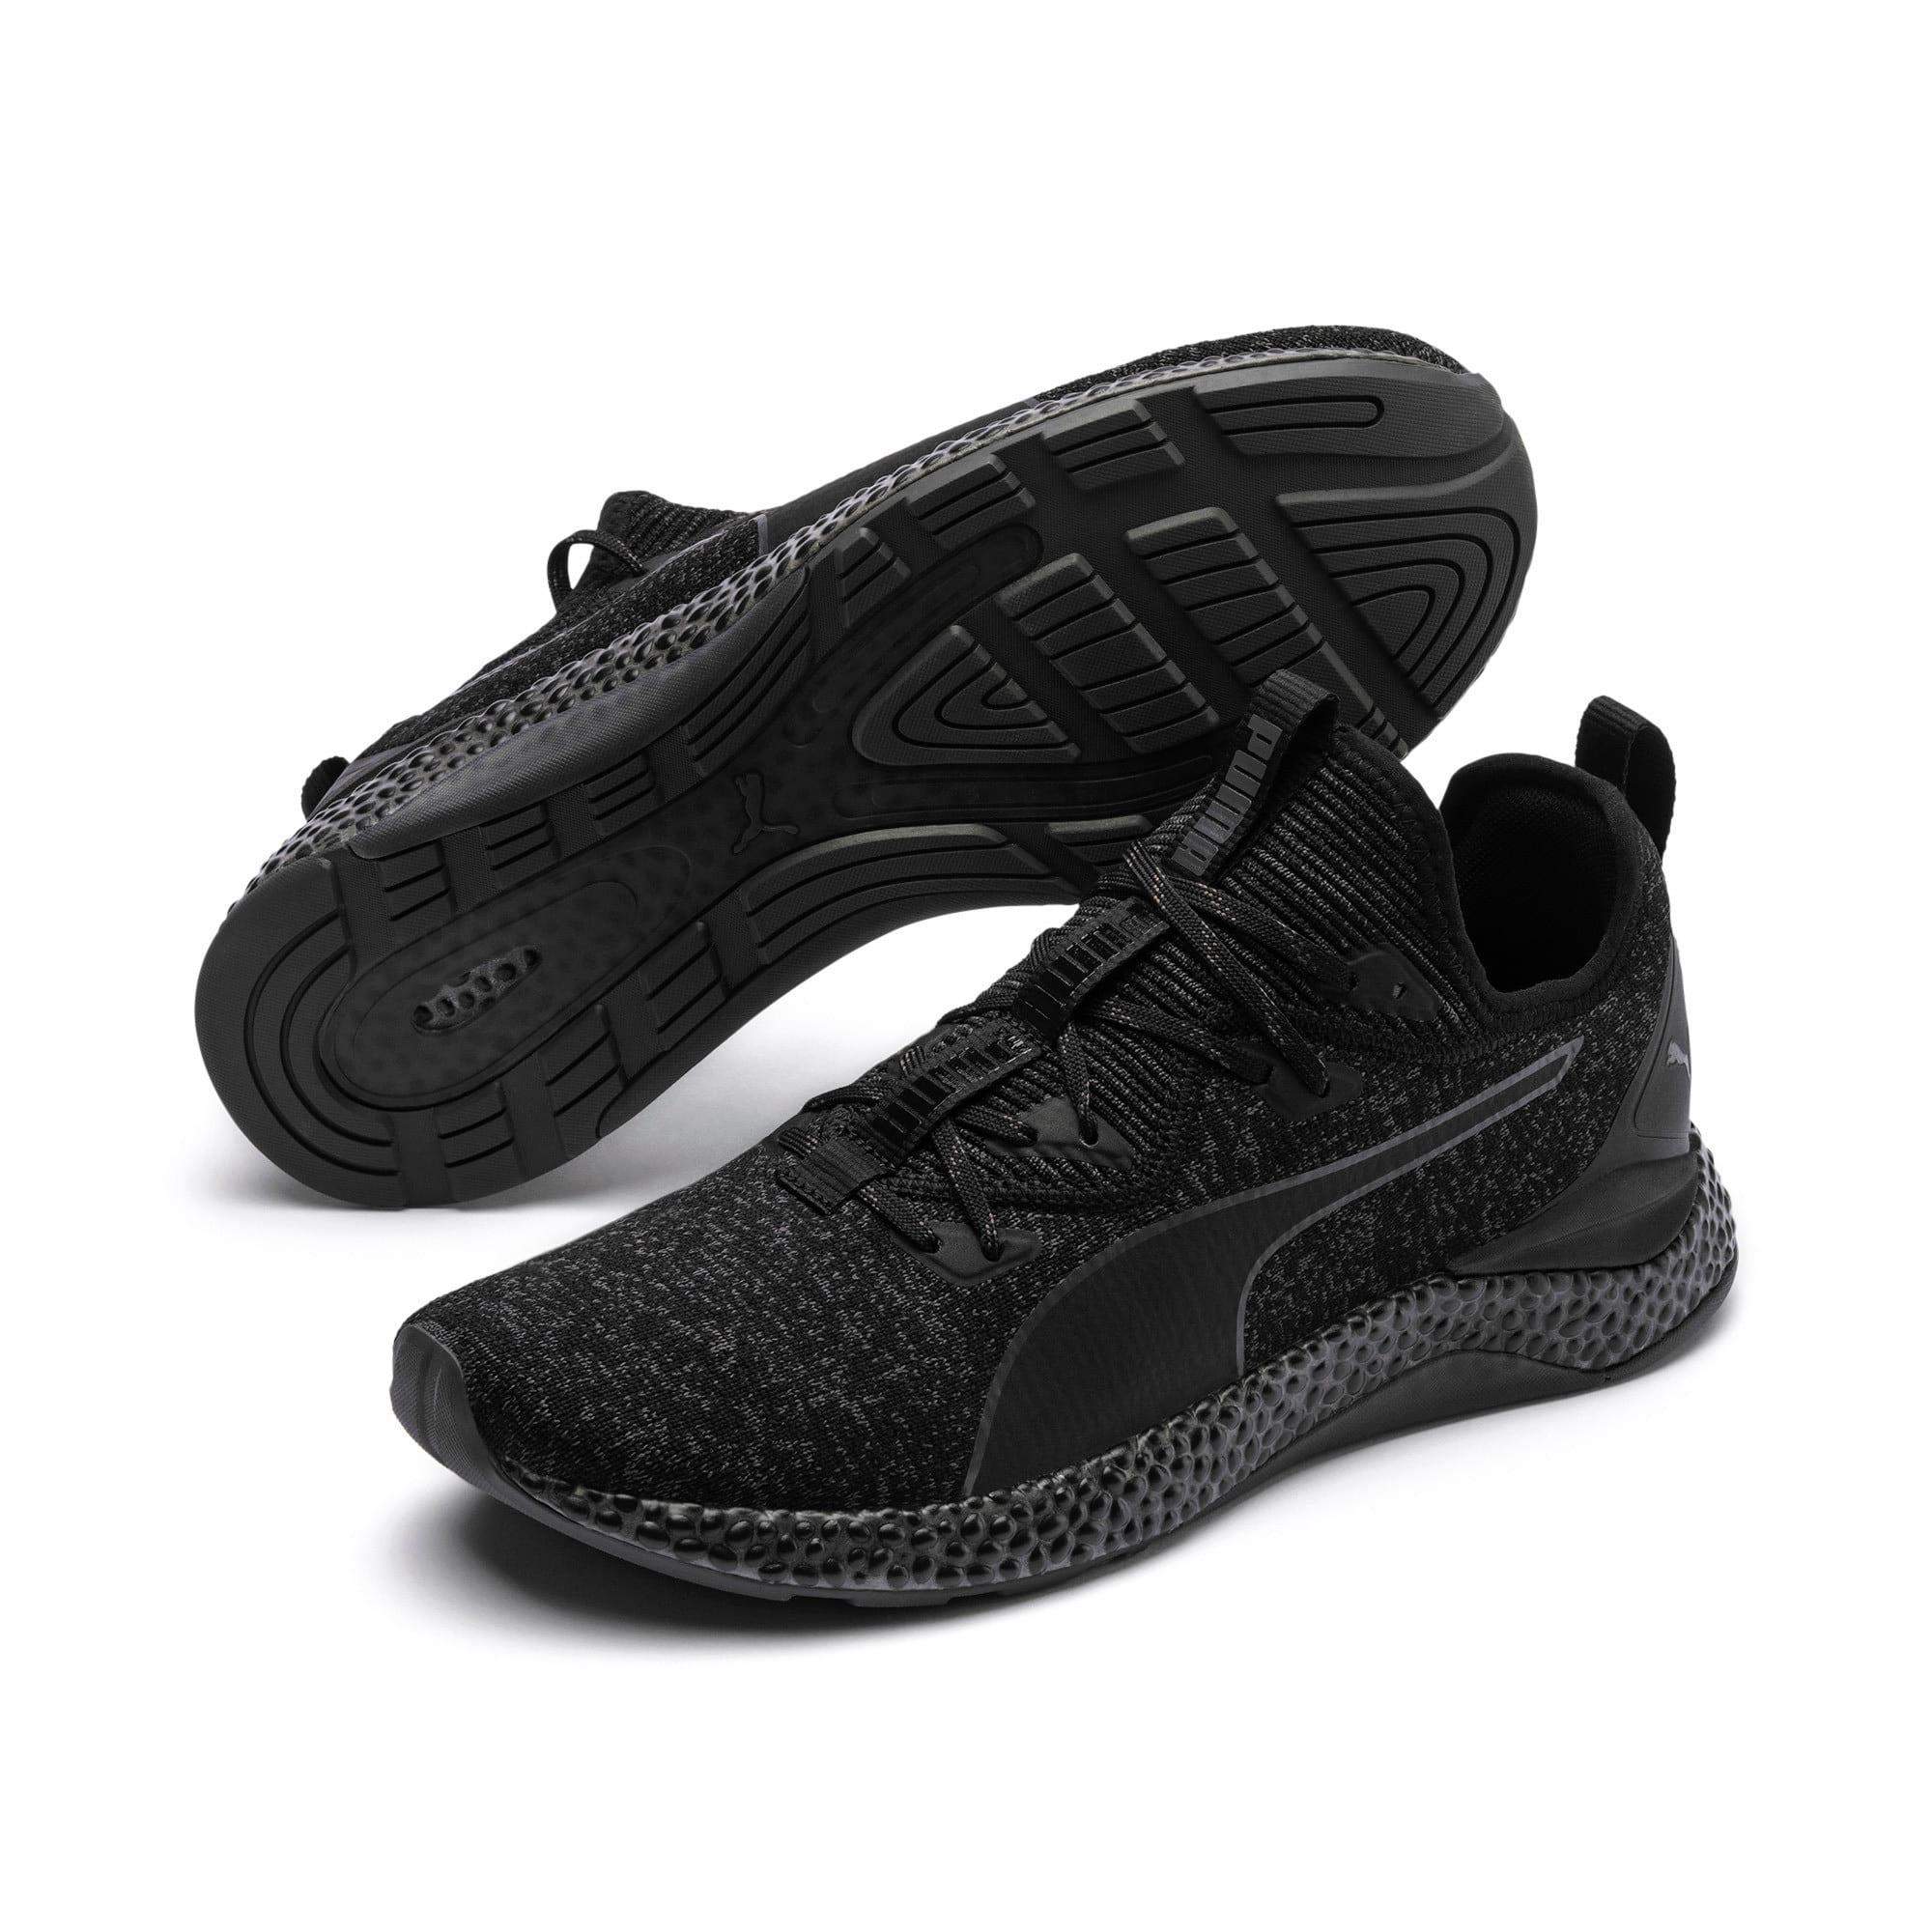 Thumbnail 3 of Hybrid Runner Men's Running Shoes, Asphalt-Puma Black, medium